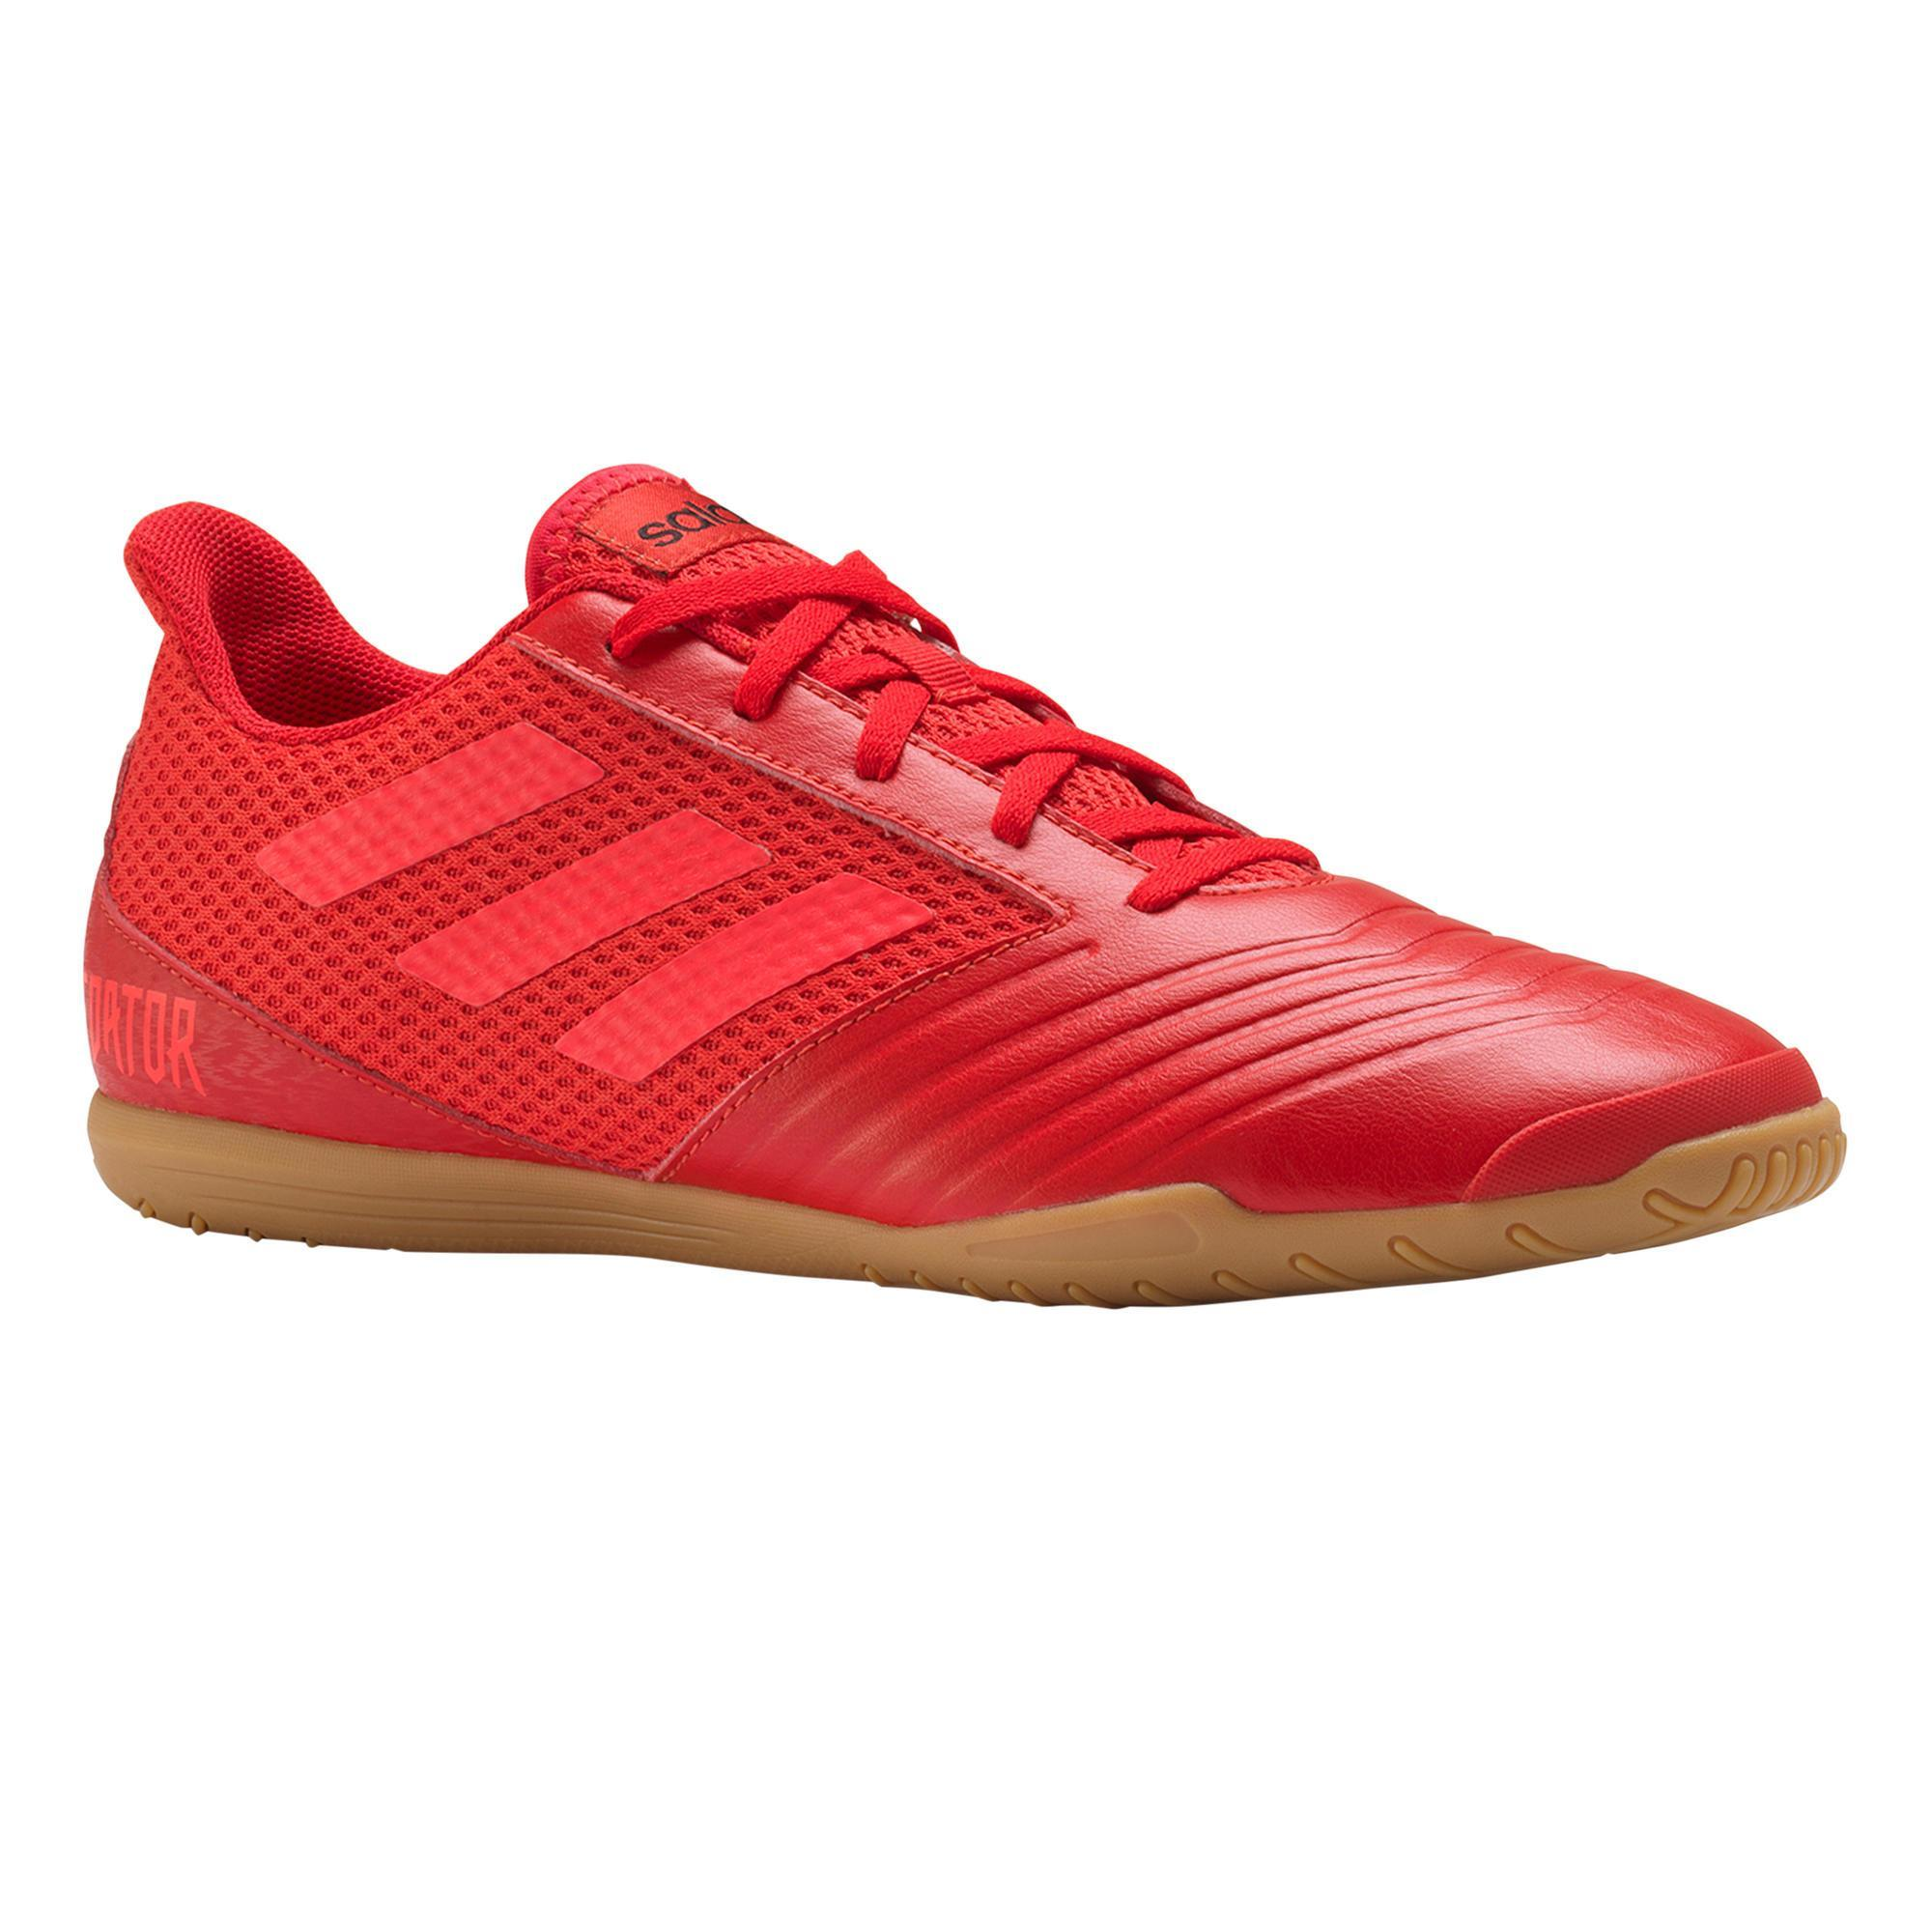 newest 7ea3f c9138 Chaussures de futsal   Decathlon